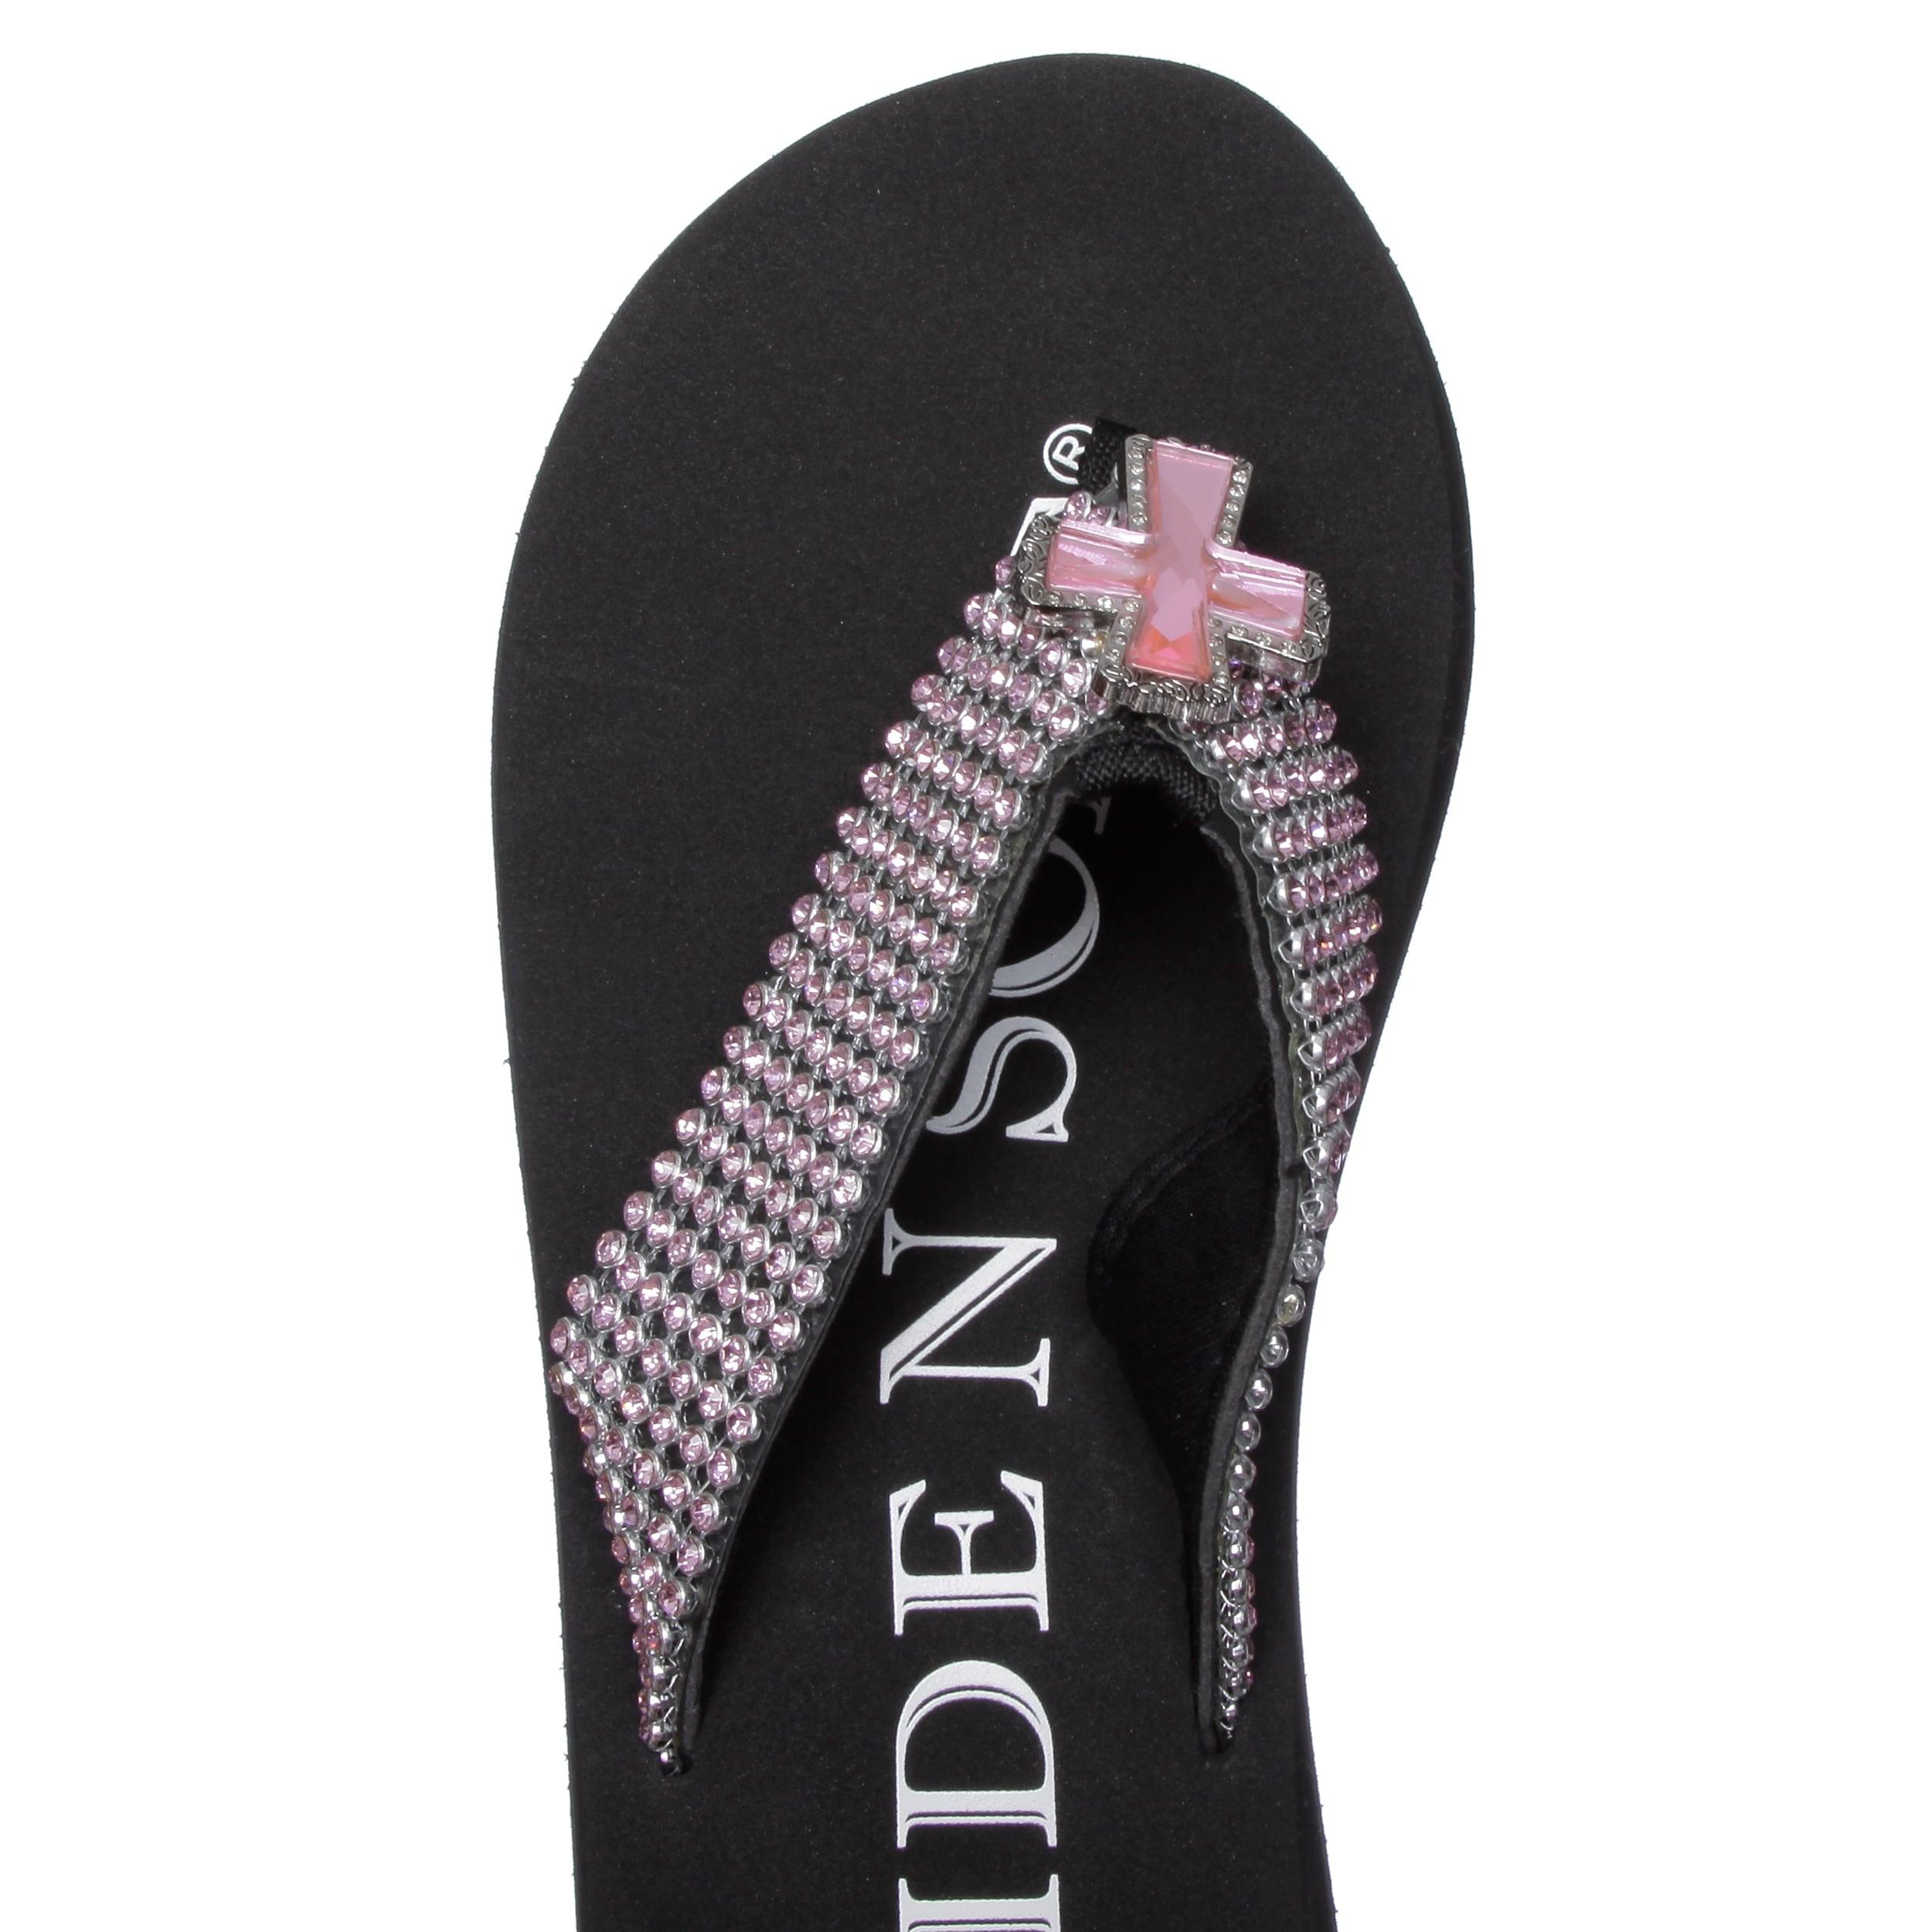 0ac0575c2 Shop Hidden Sole Women s Black Rhinestone Flip Flops - Free Shipping Today  - Overstock - 6602223